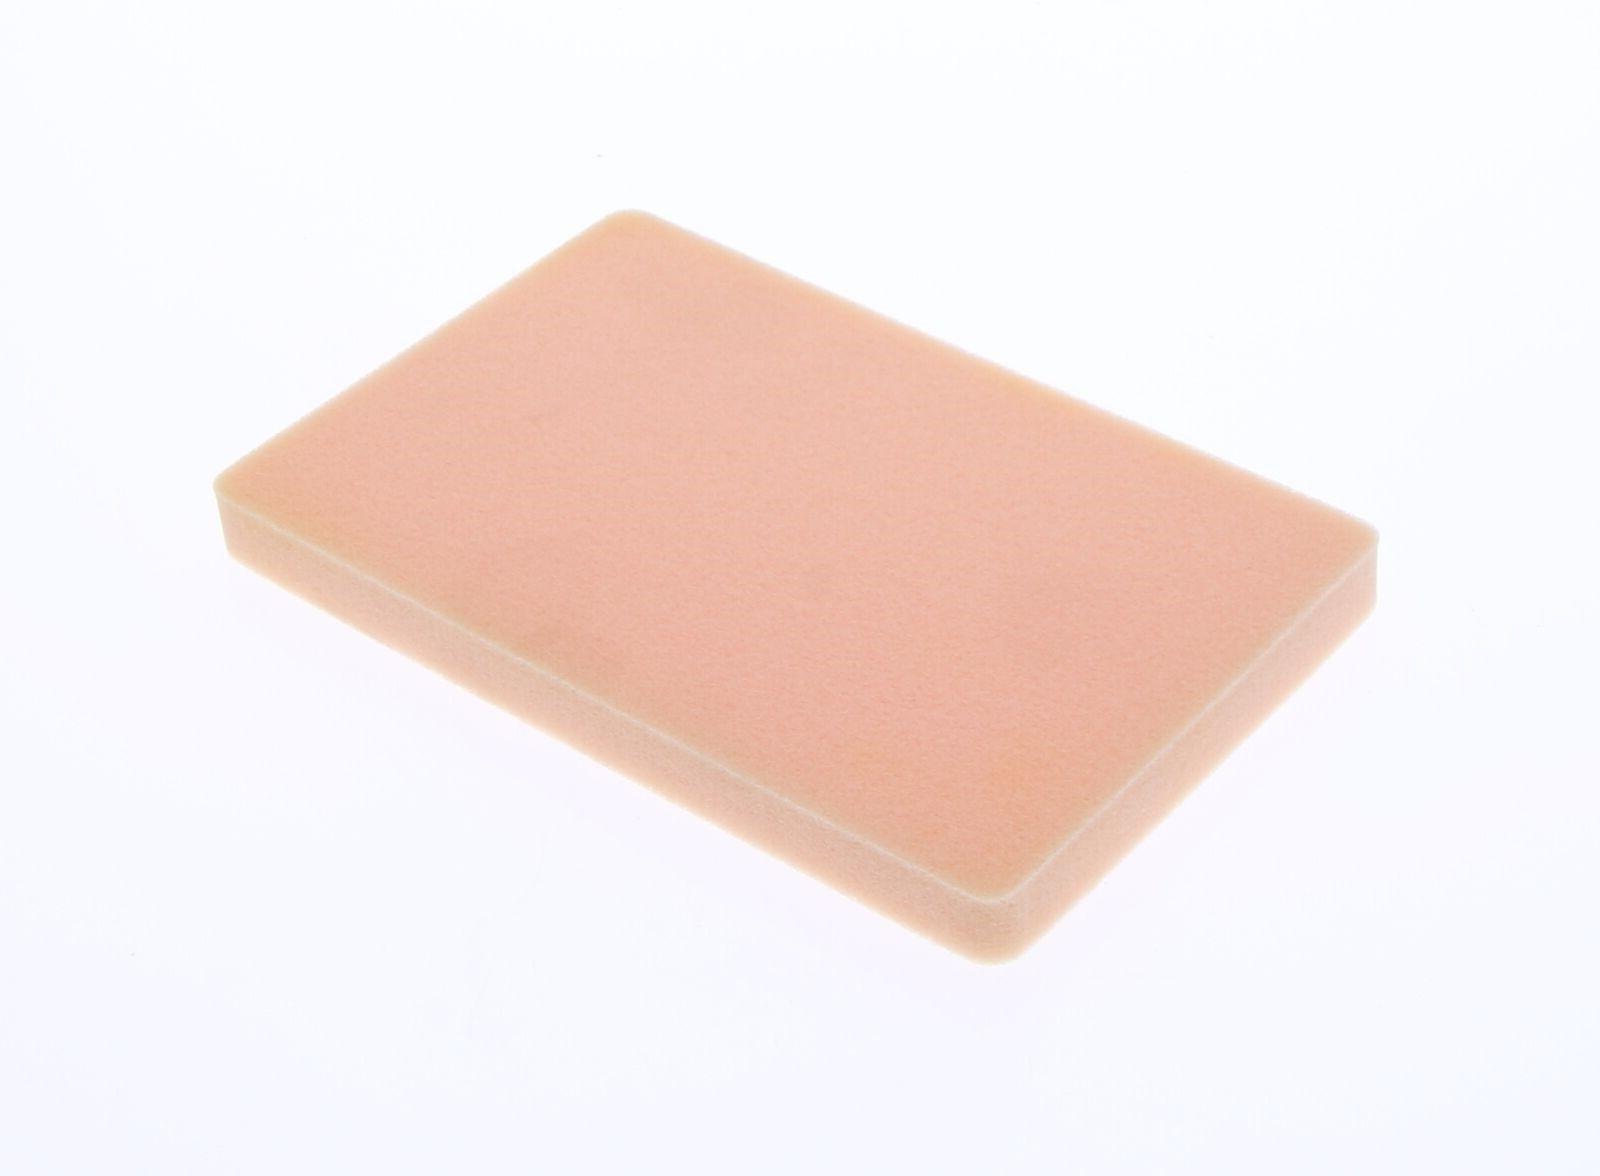 Shindaiwa A226000540 Foam Pre-Filter